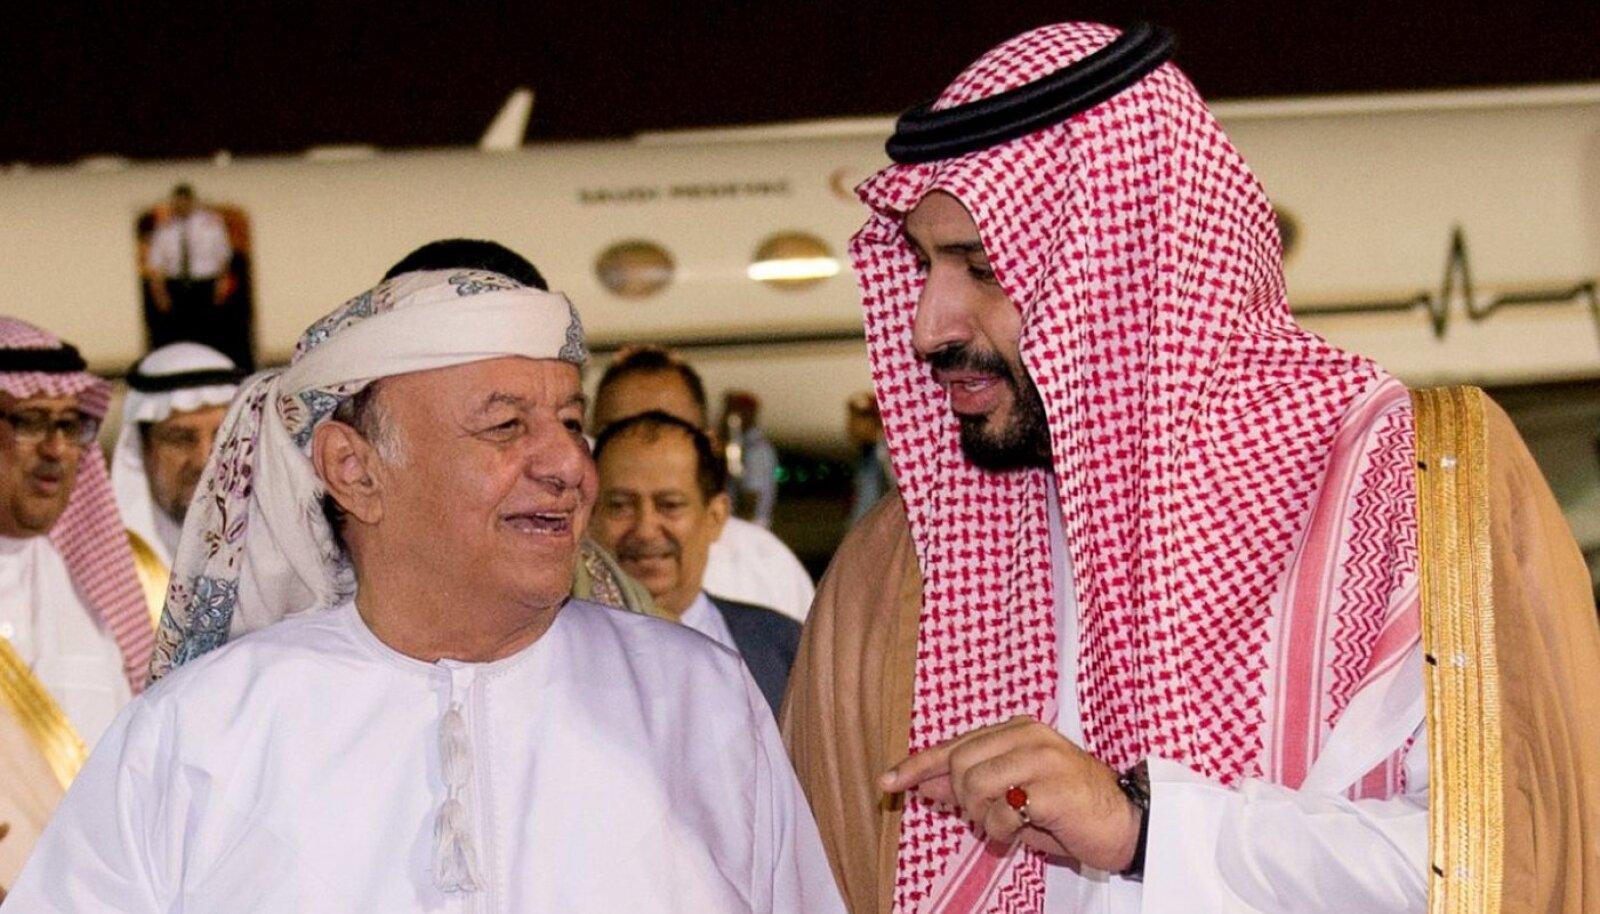 Jeemeni president Hadi ja Saudi Araabia kaitseminister bin Salman